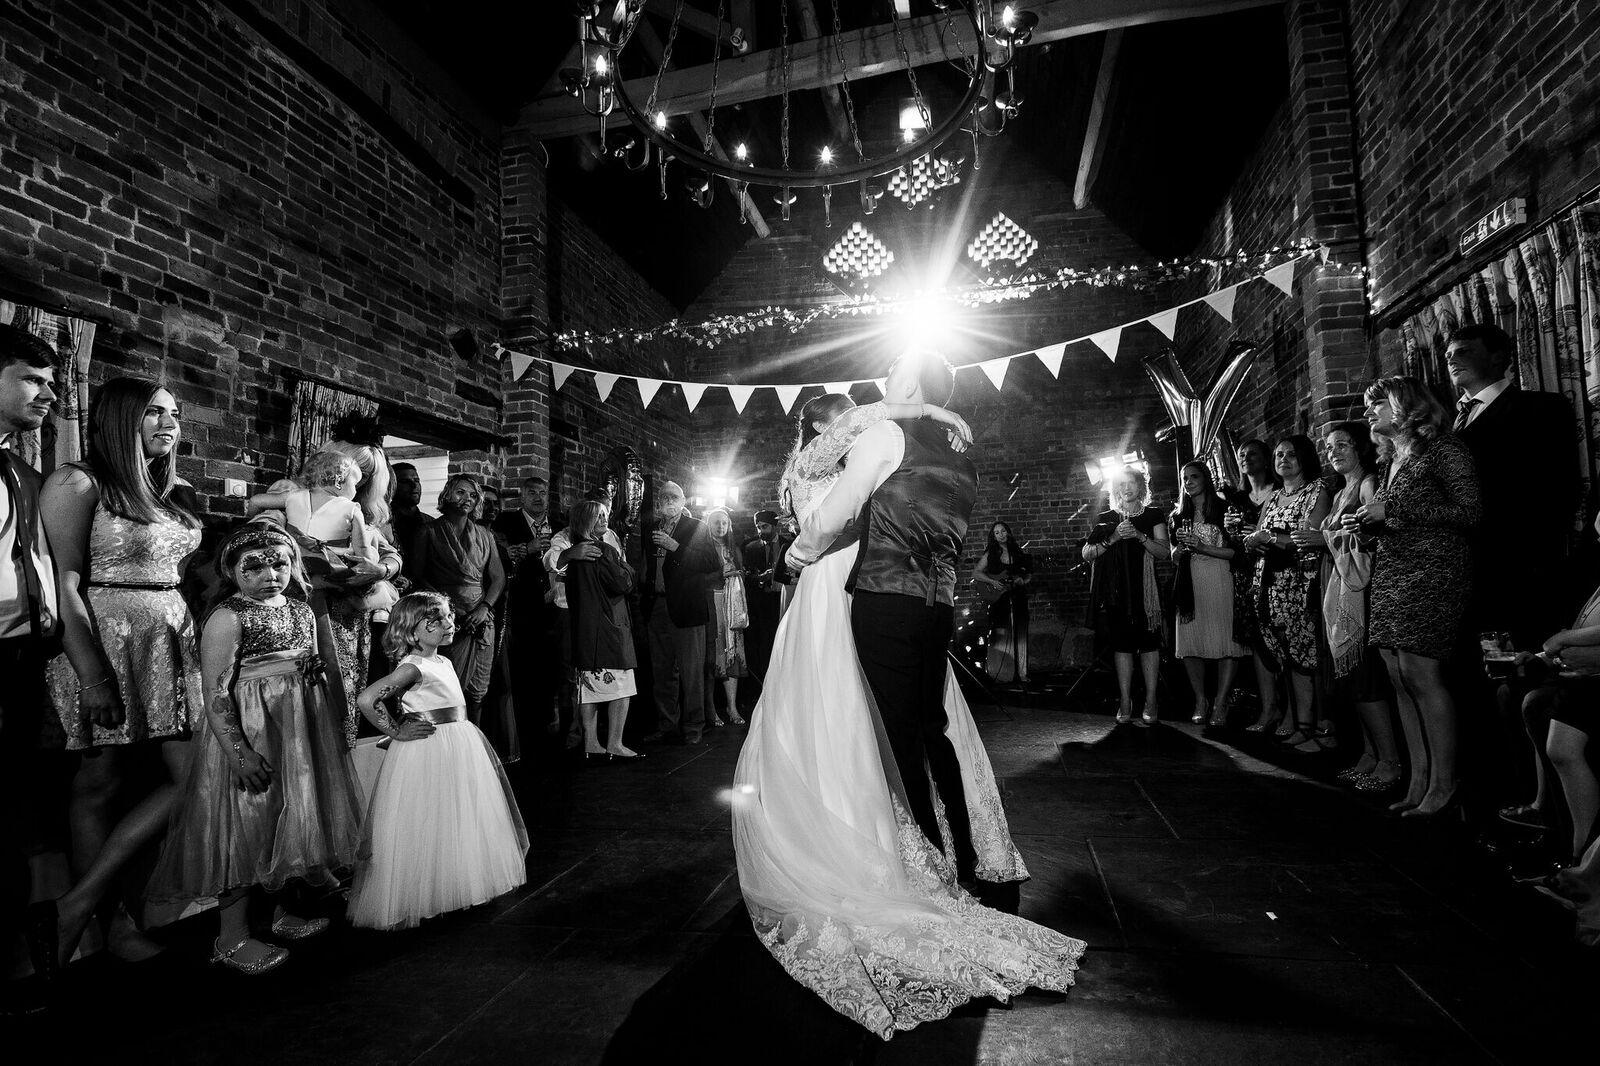 Curradine Barns wedding band | The Distance